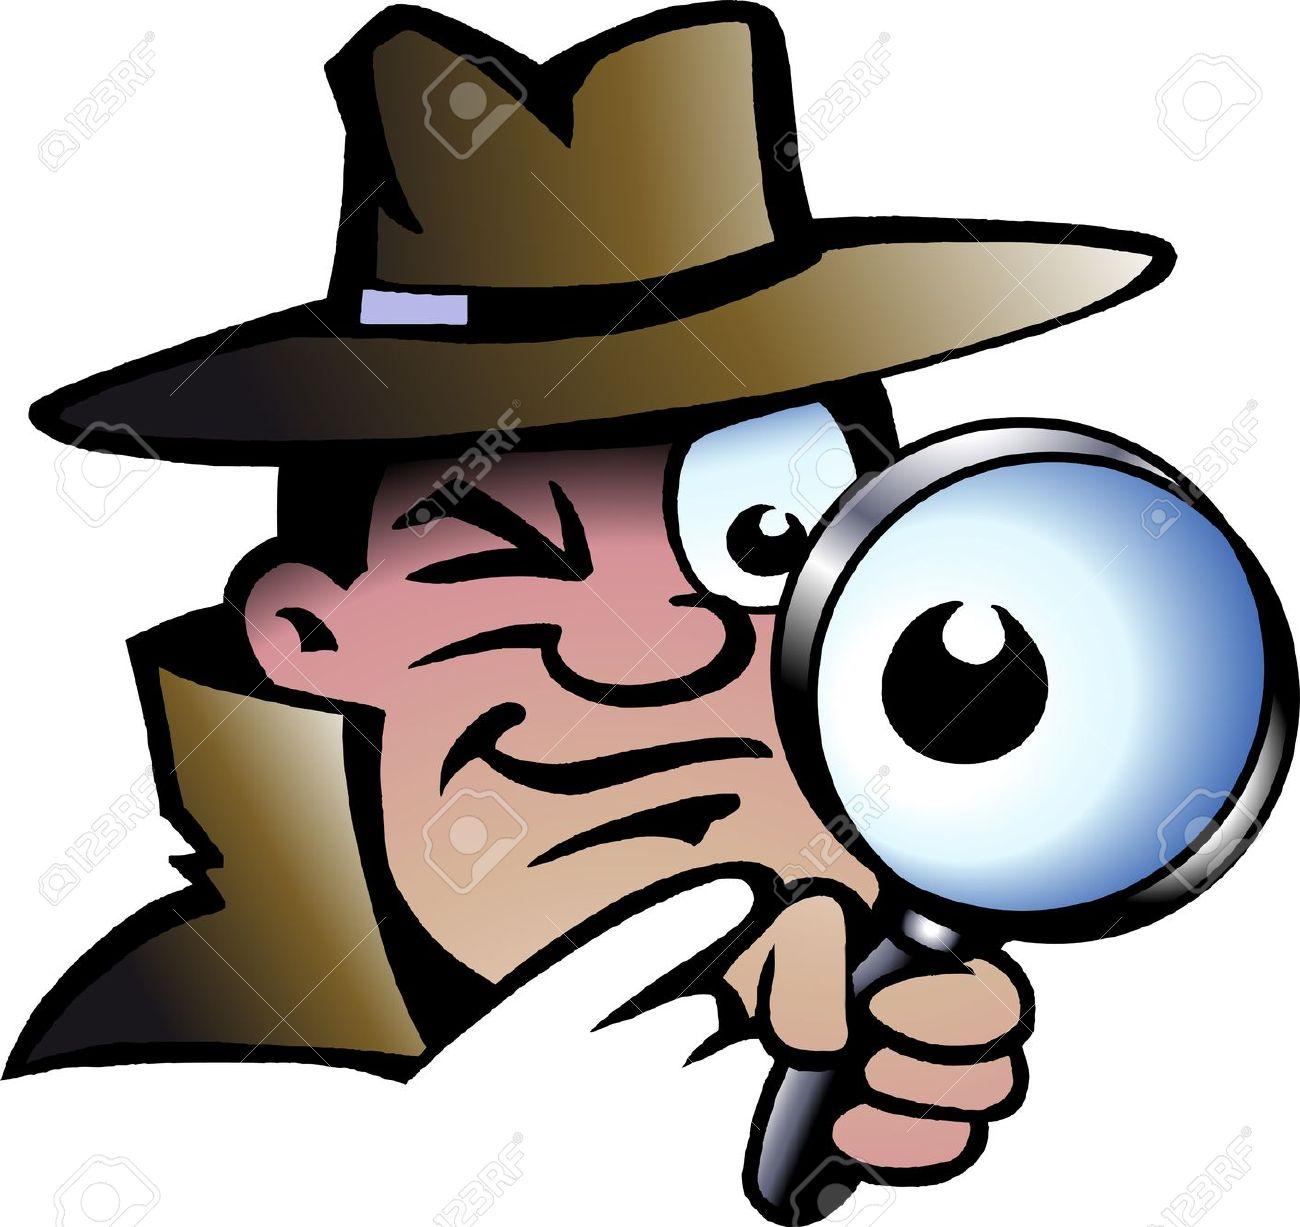 secret agent hand drawn clipart panda free clipart images rh clipartpanda com secret agent badge clipart secret agent clipart images